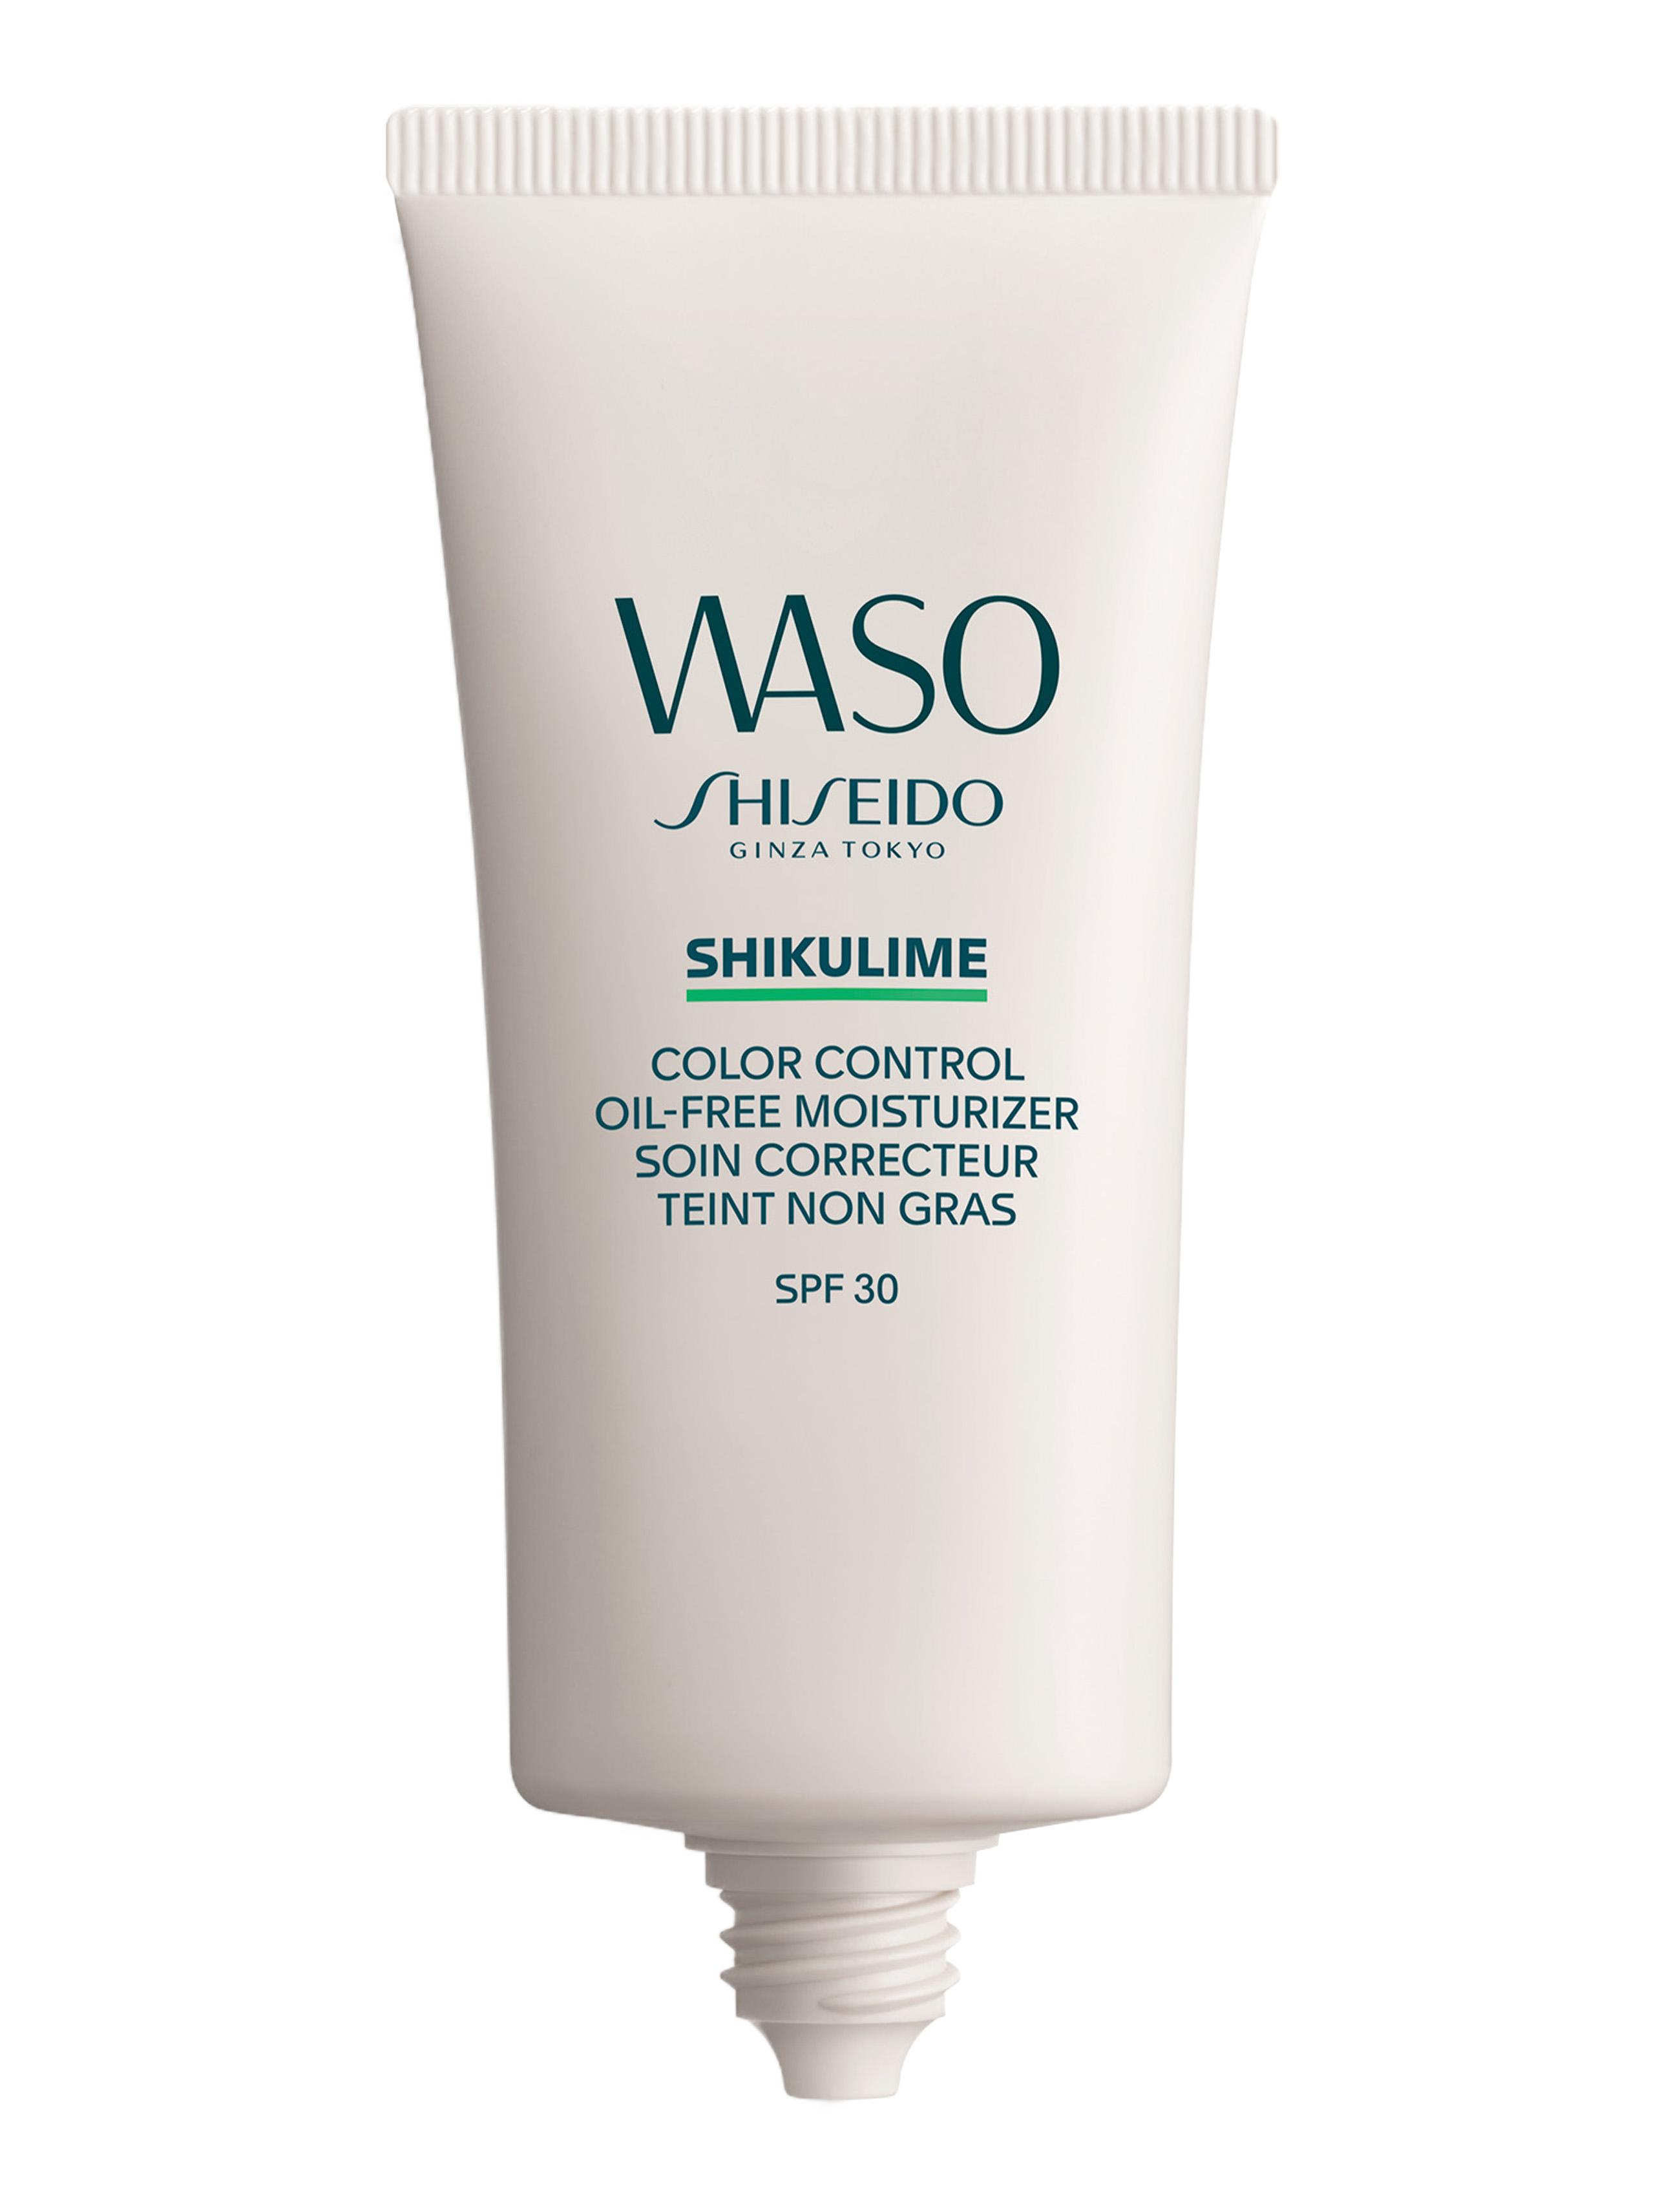 Shiseido Waso Color Control Moisturizer, 50 ml